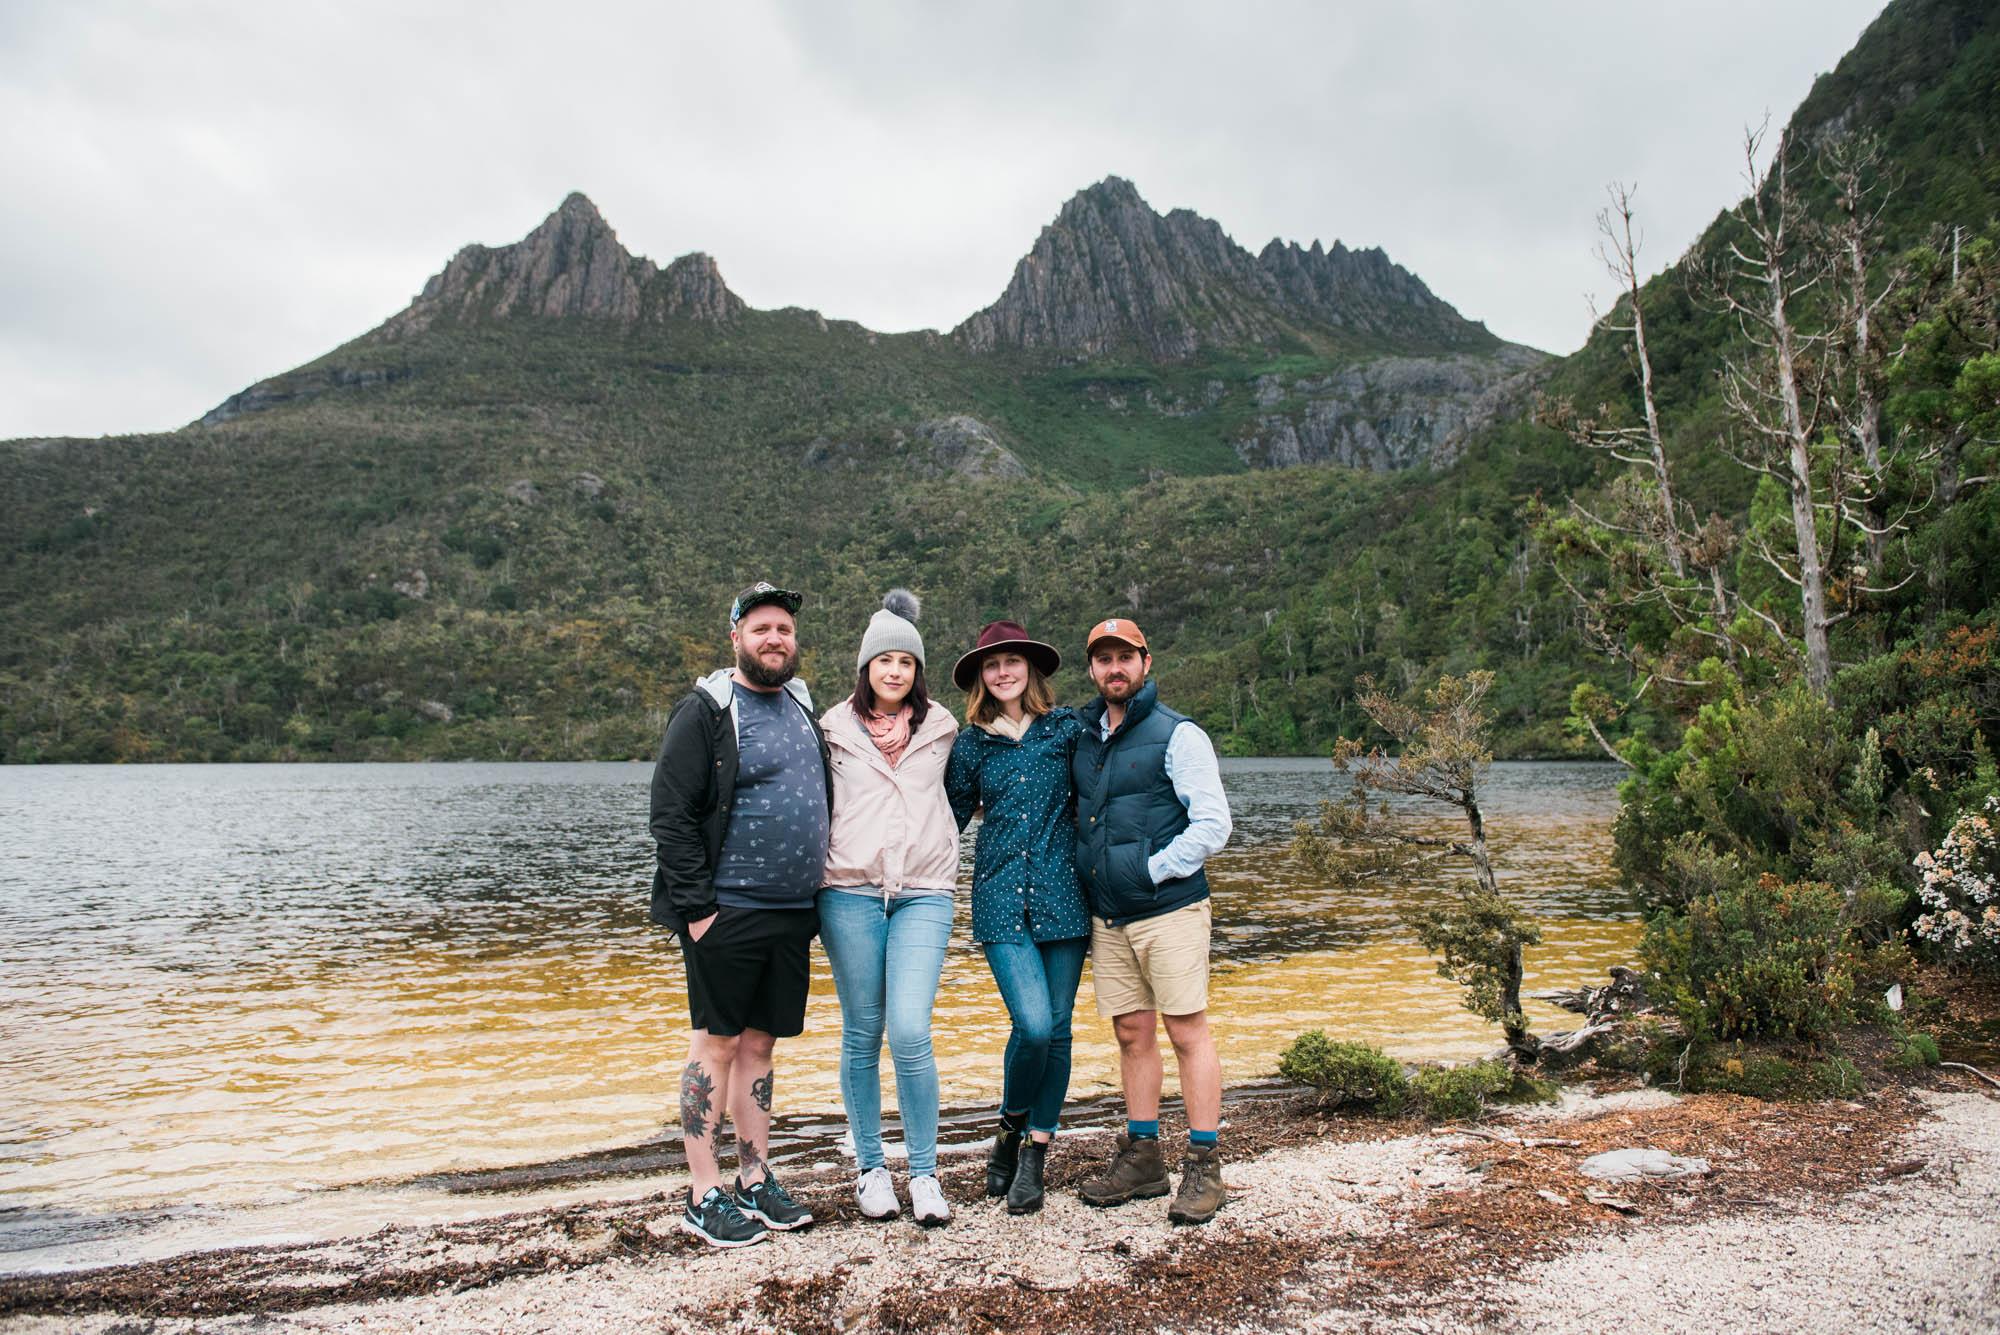 WEB-hannah puechmarin-tasmania photographer-9307.jpg